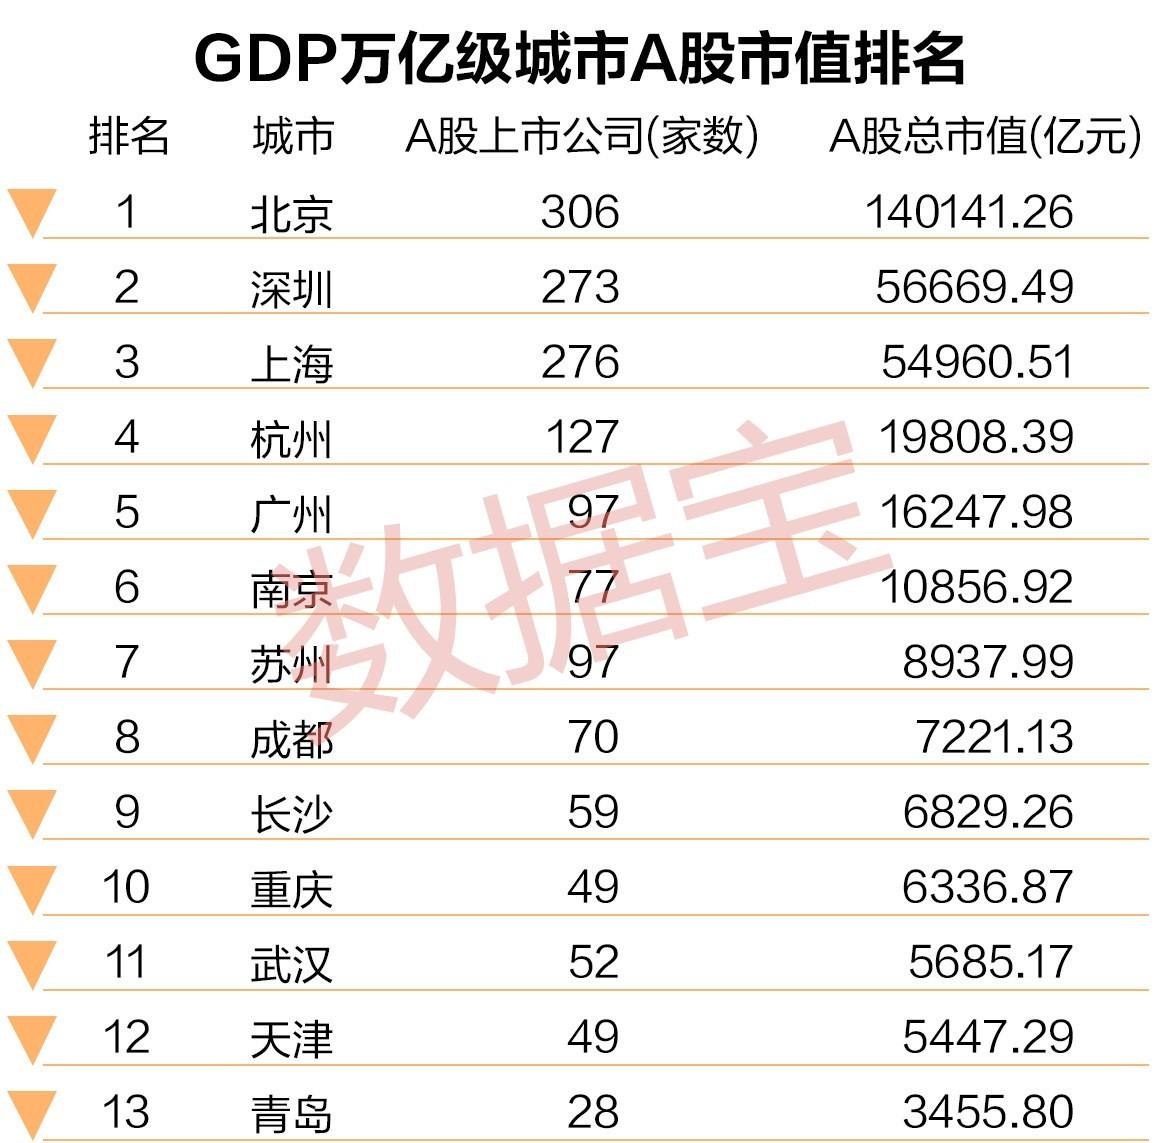 gdp万亿级_大武汉牛皮 万亿级GDP城市增速排第三,不过竟然被这个城市超了...